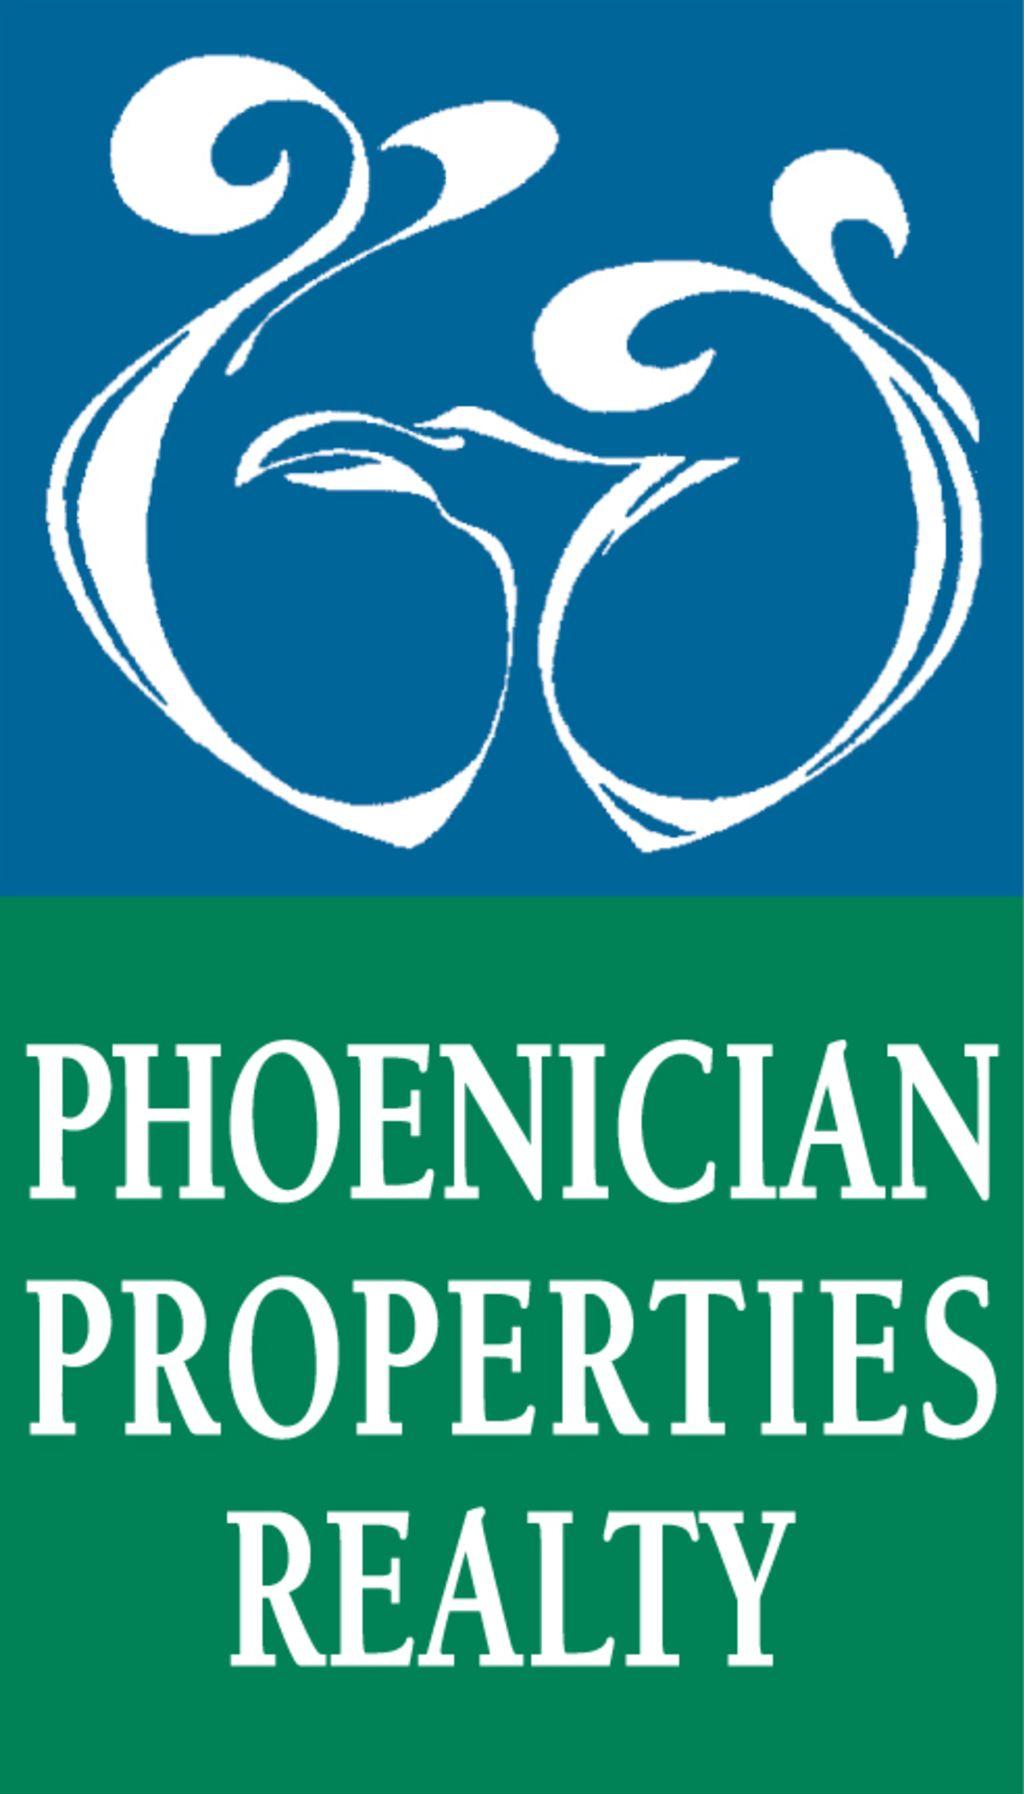 Phoenician Properties Realty